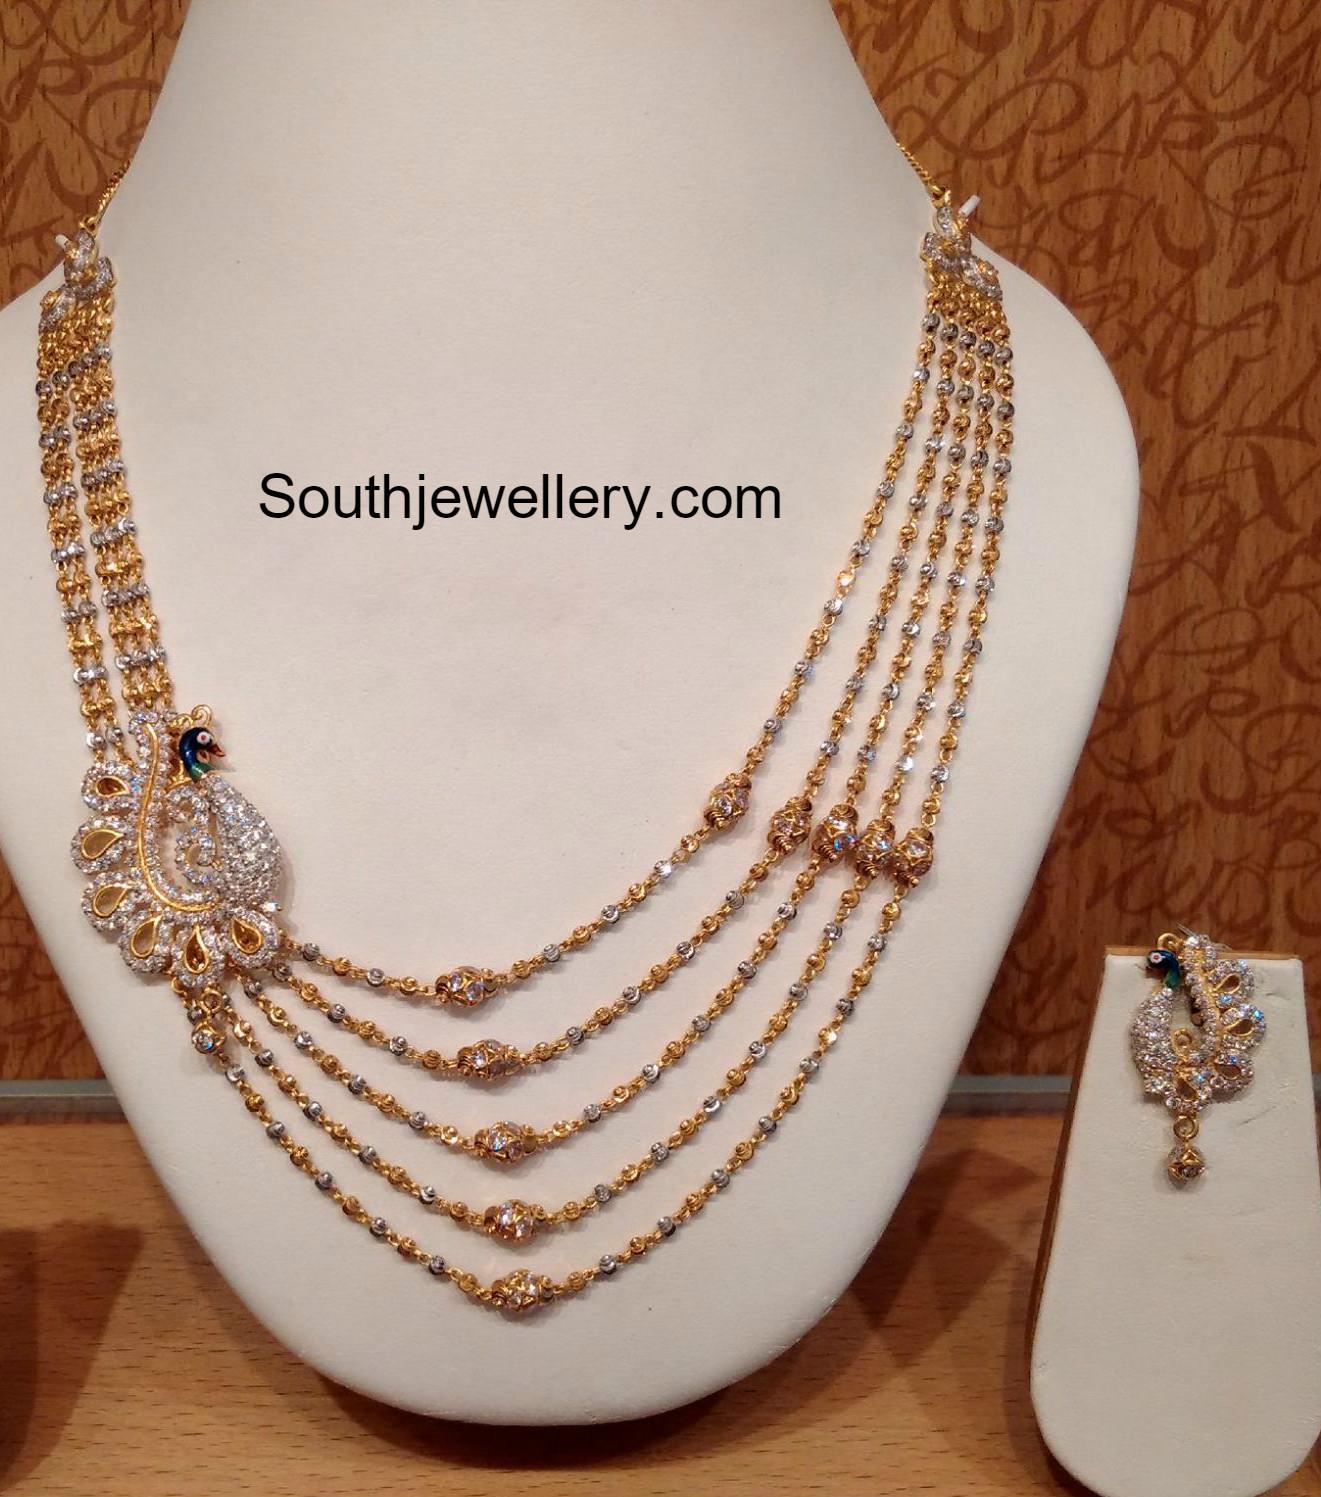 step chain models latest jewelry designs - Jewellery Designs